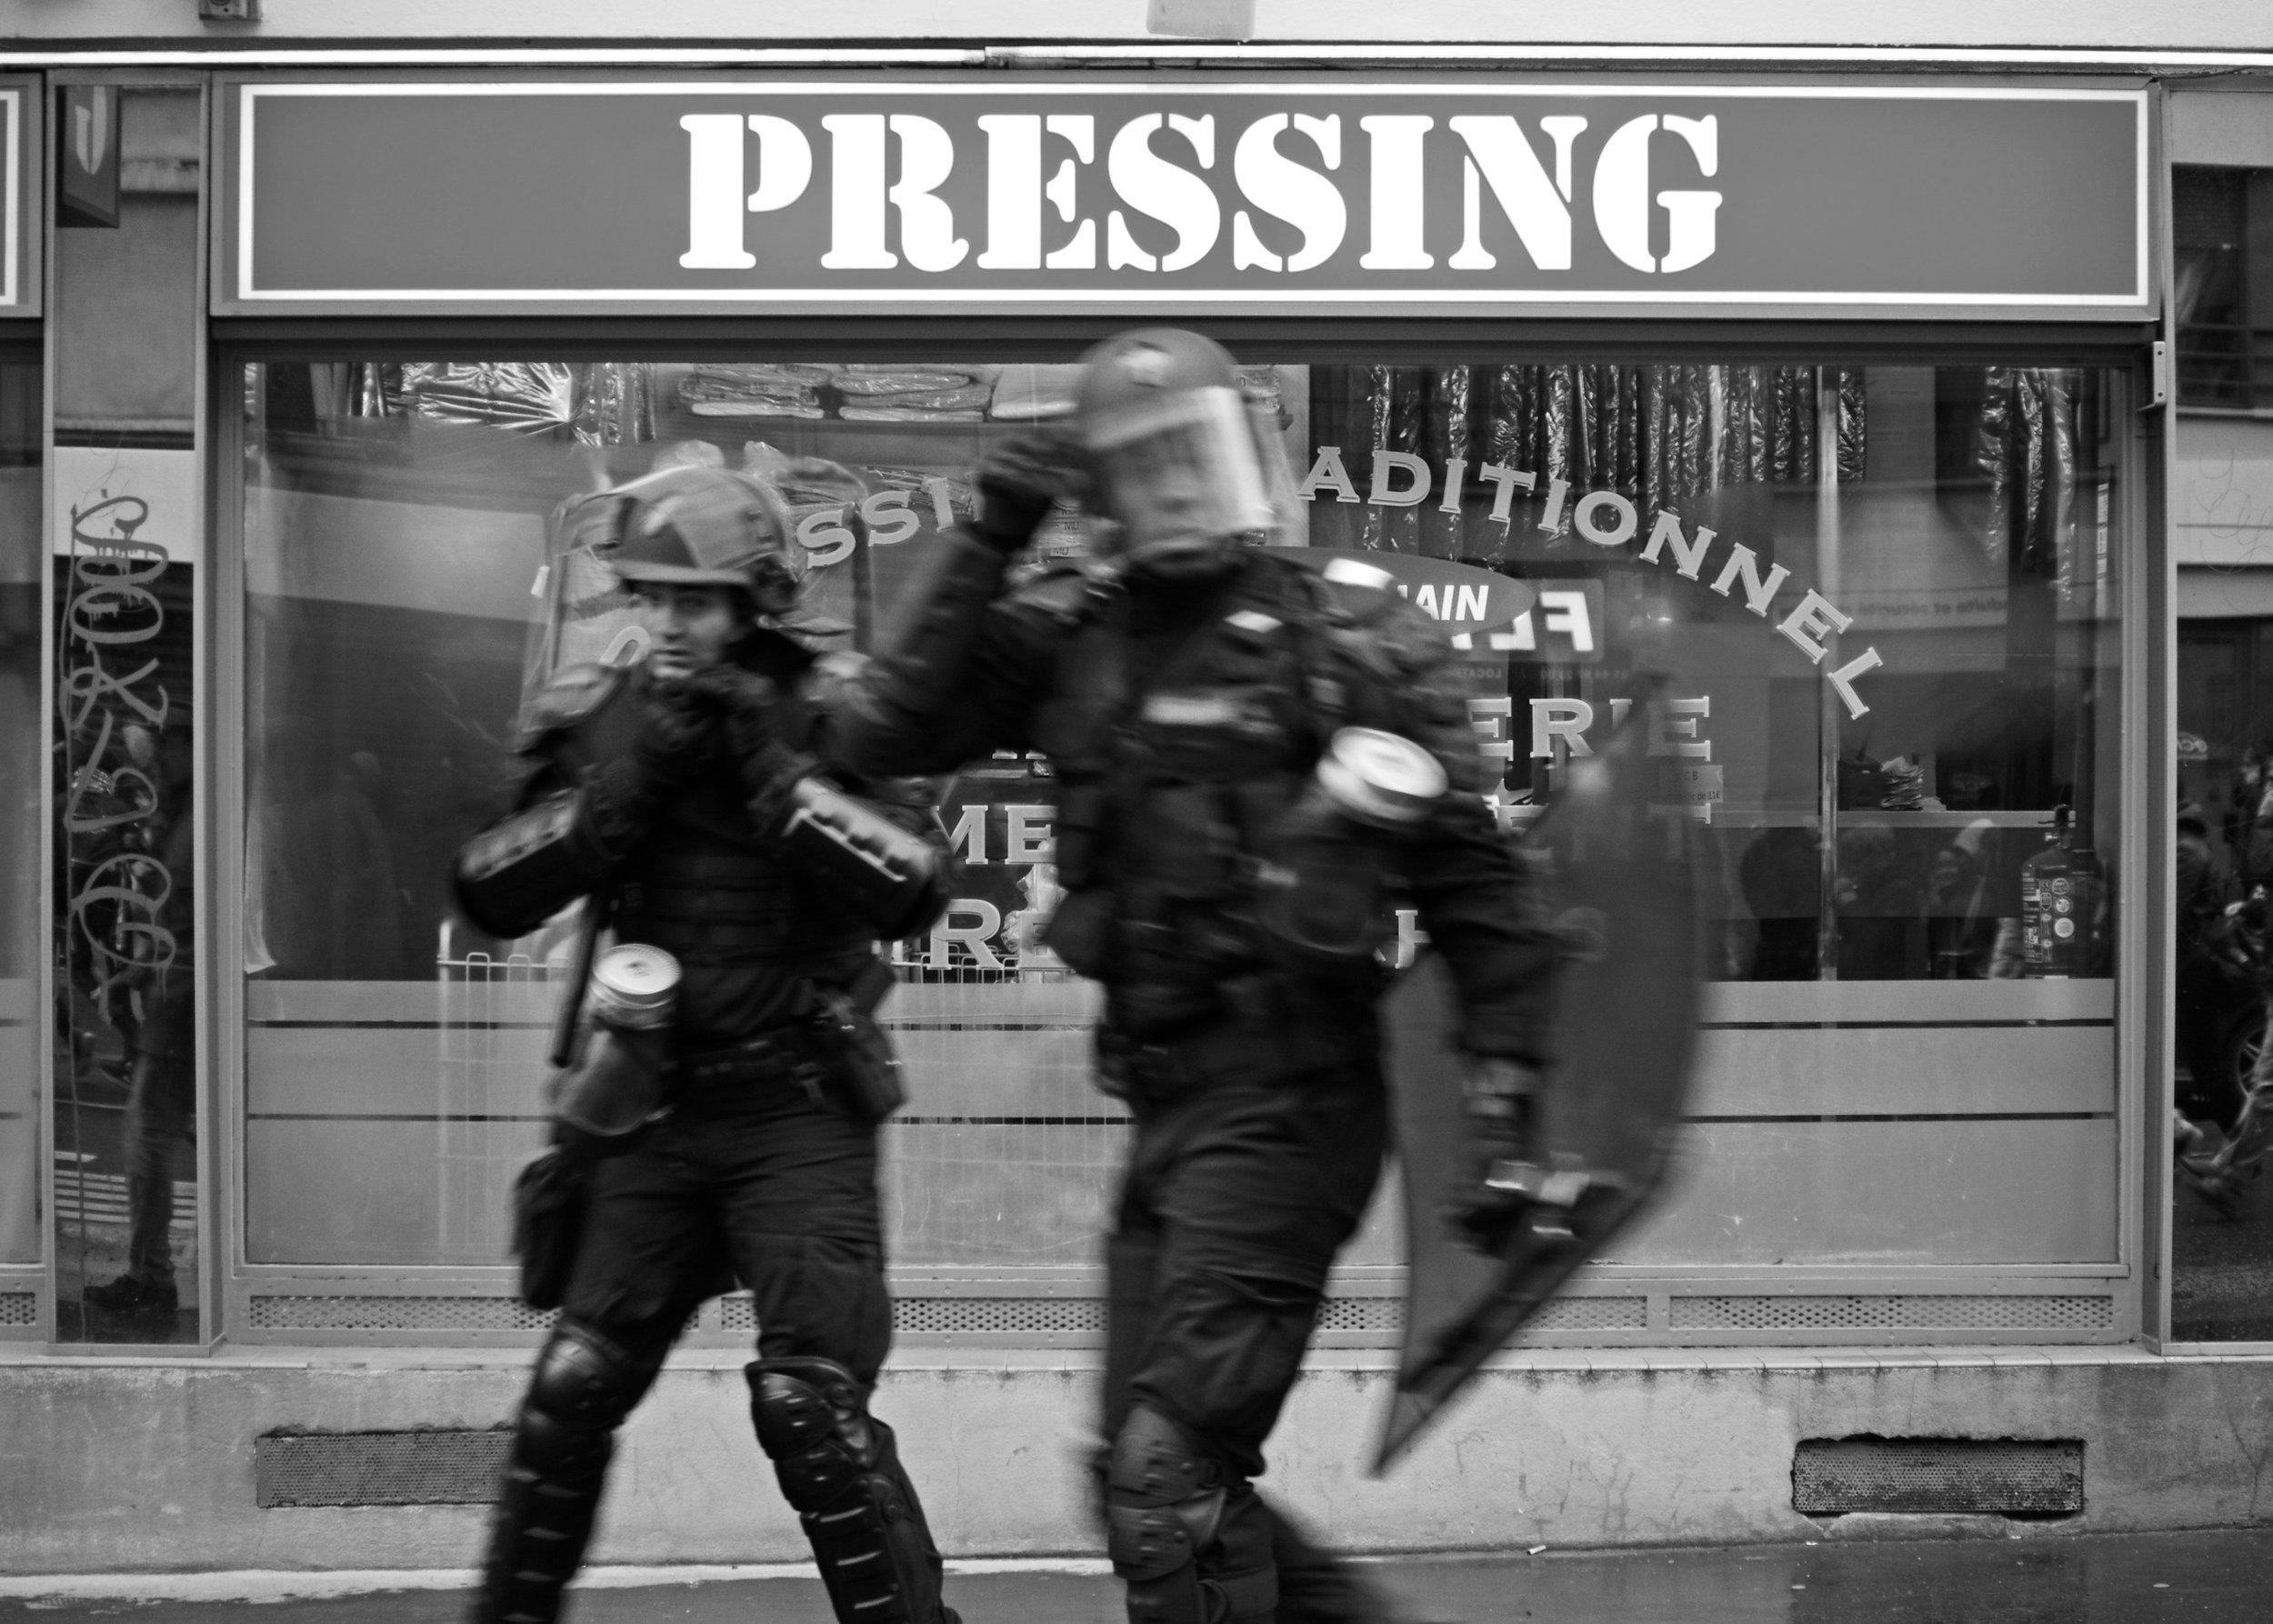 Pressing.